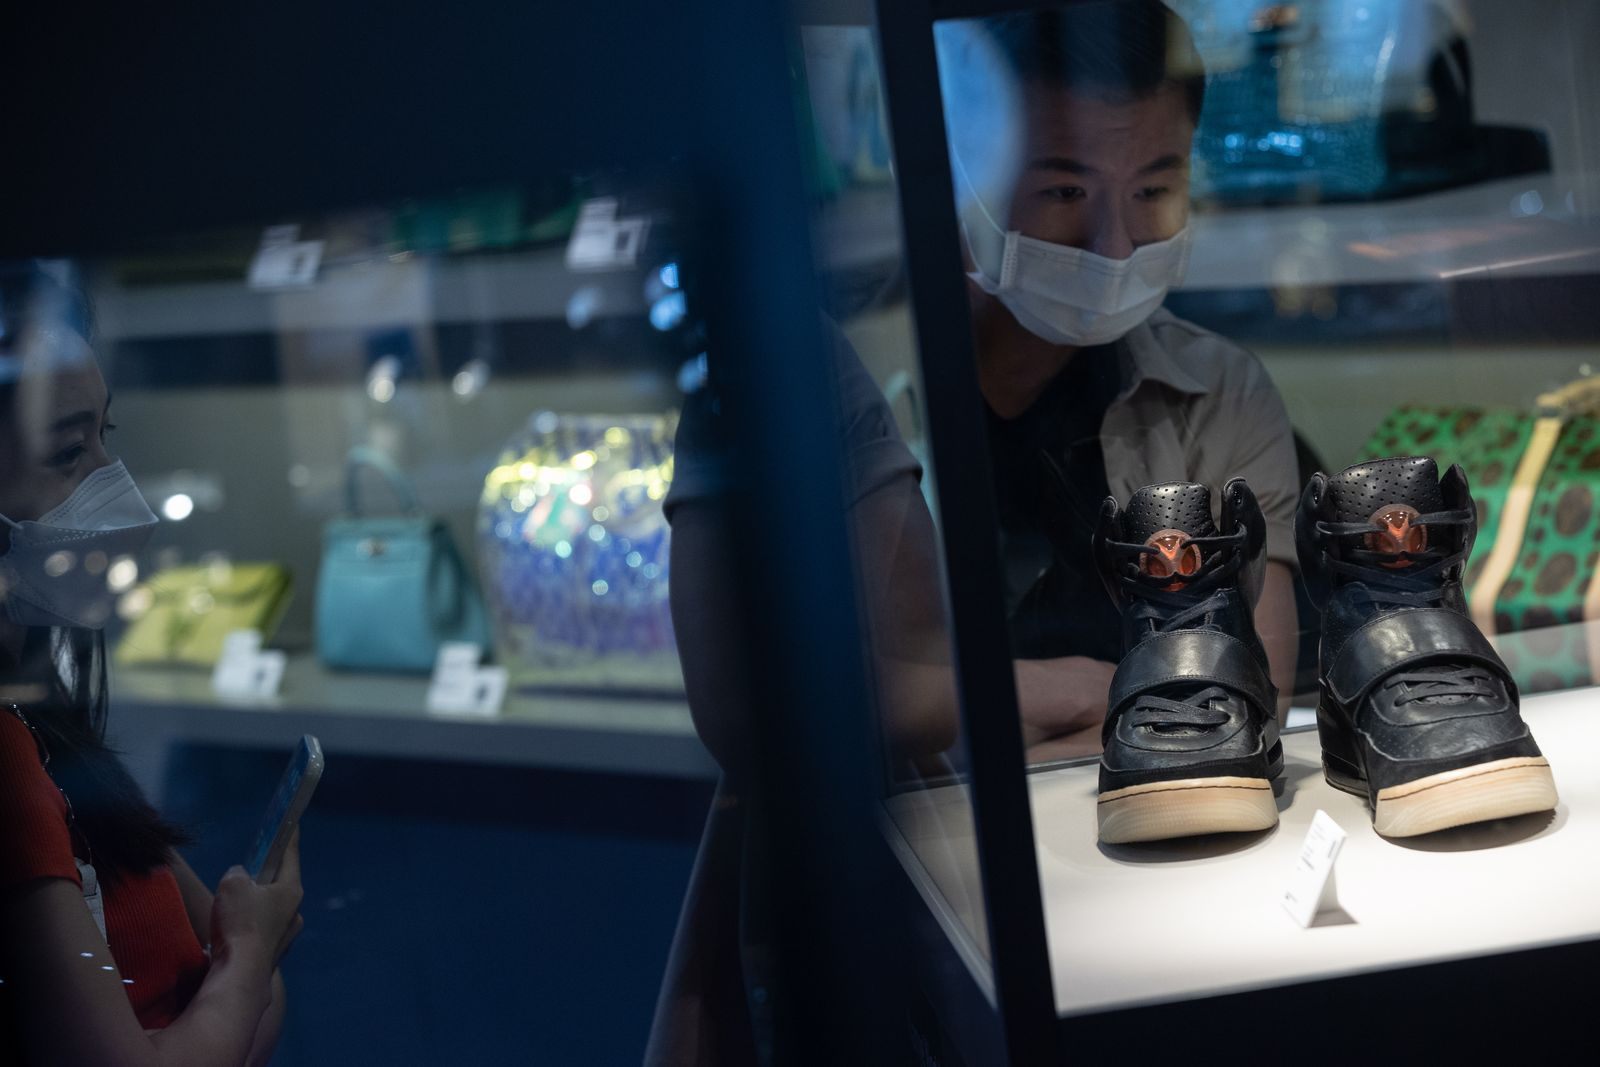 Kanye West 'Grammy Worn' Nike Air Yeezy 1 Prototype